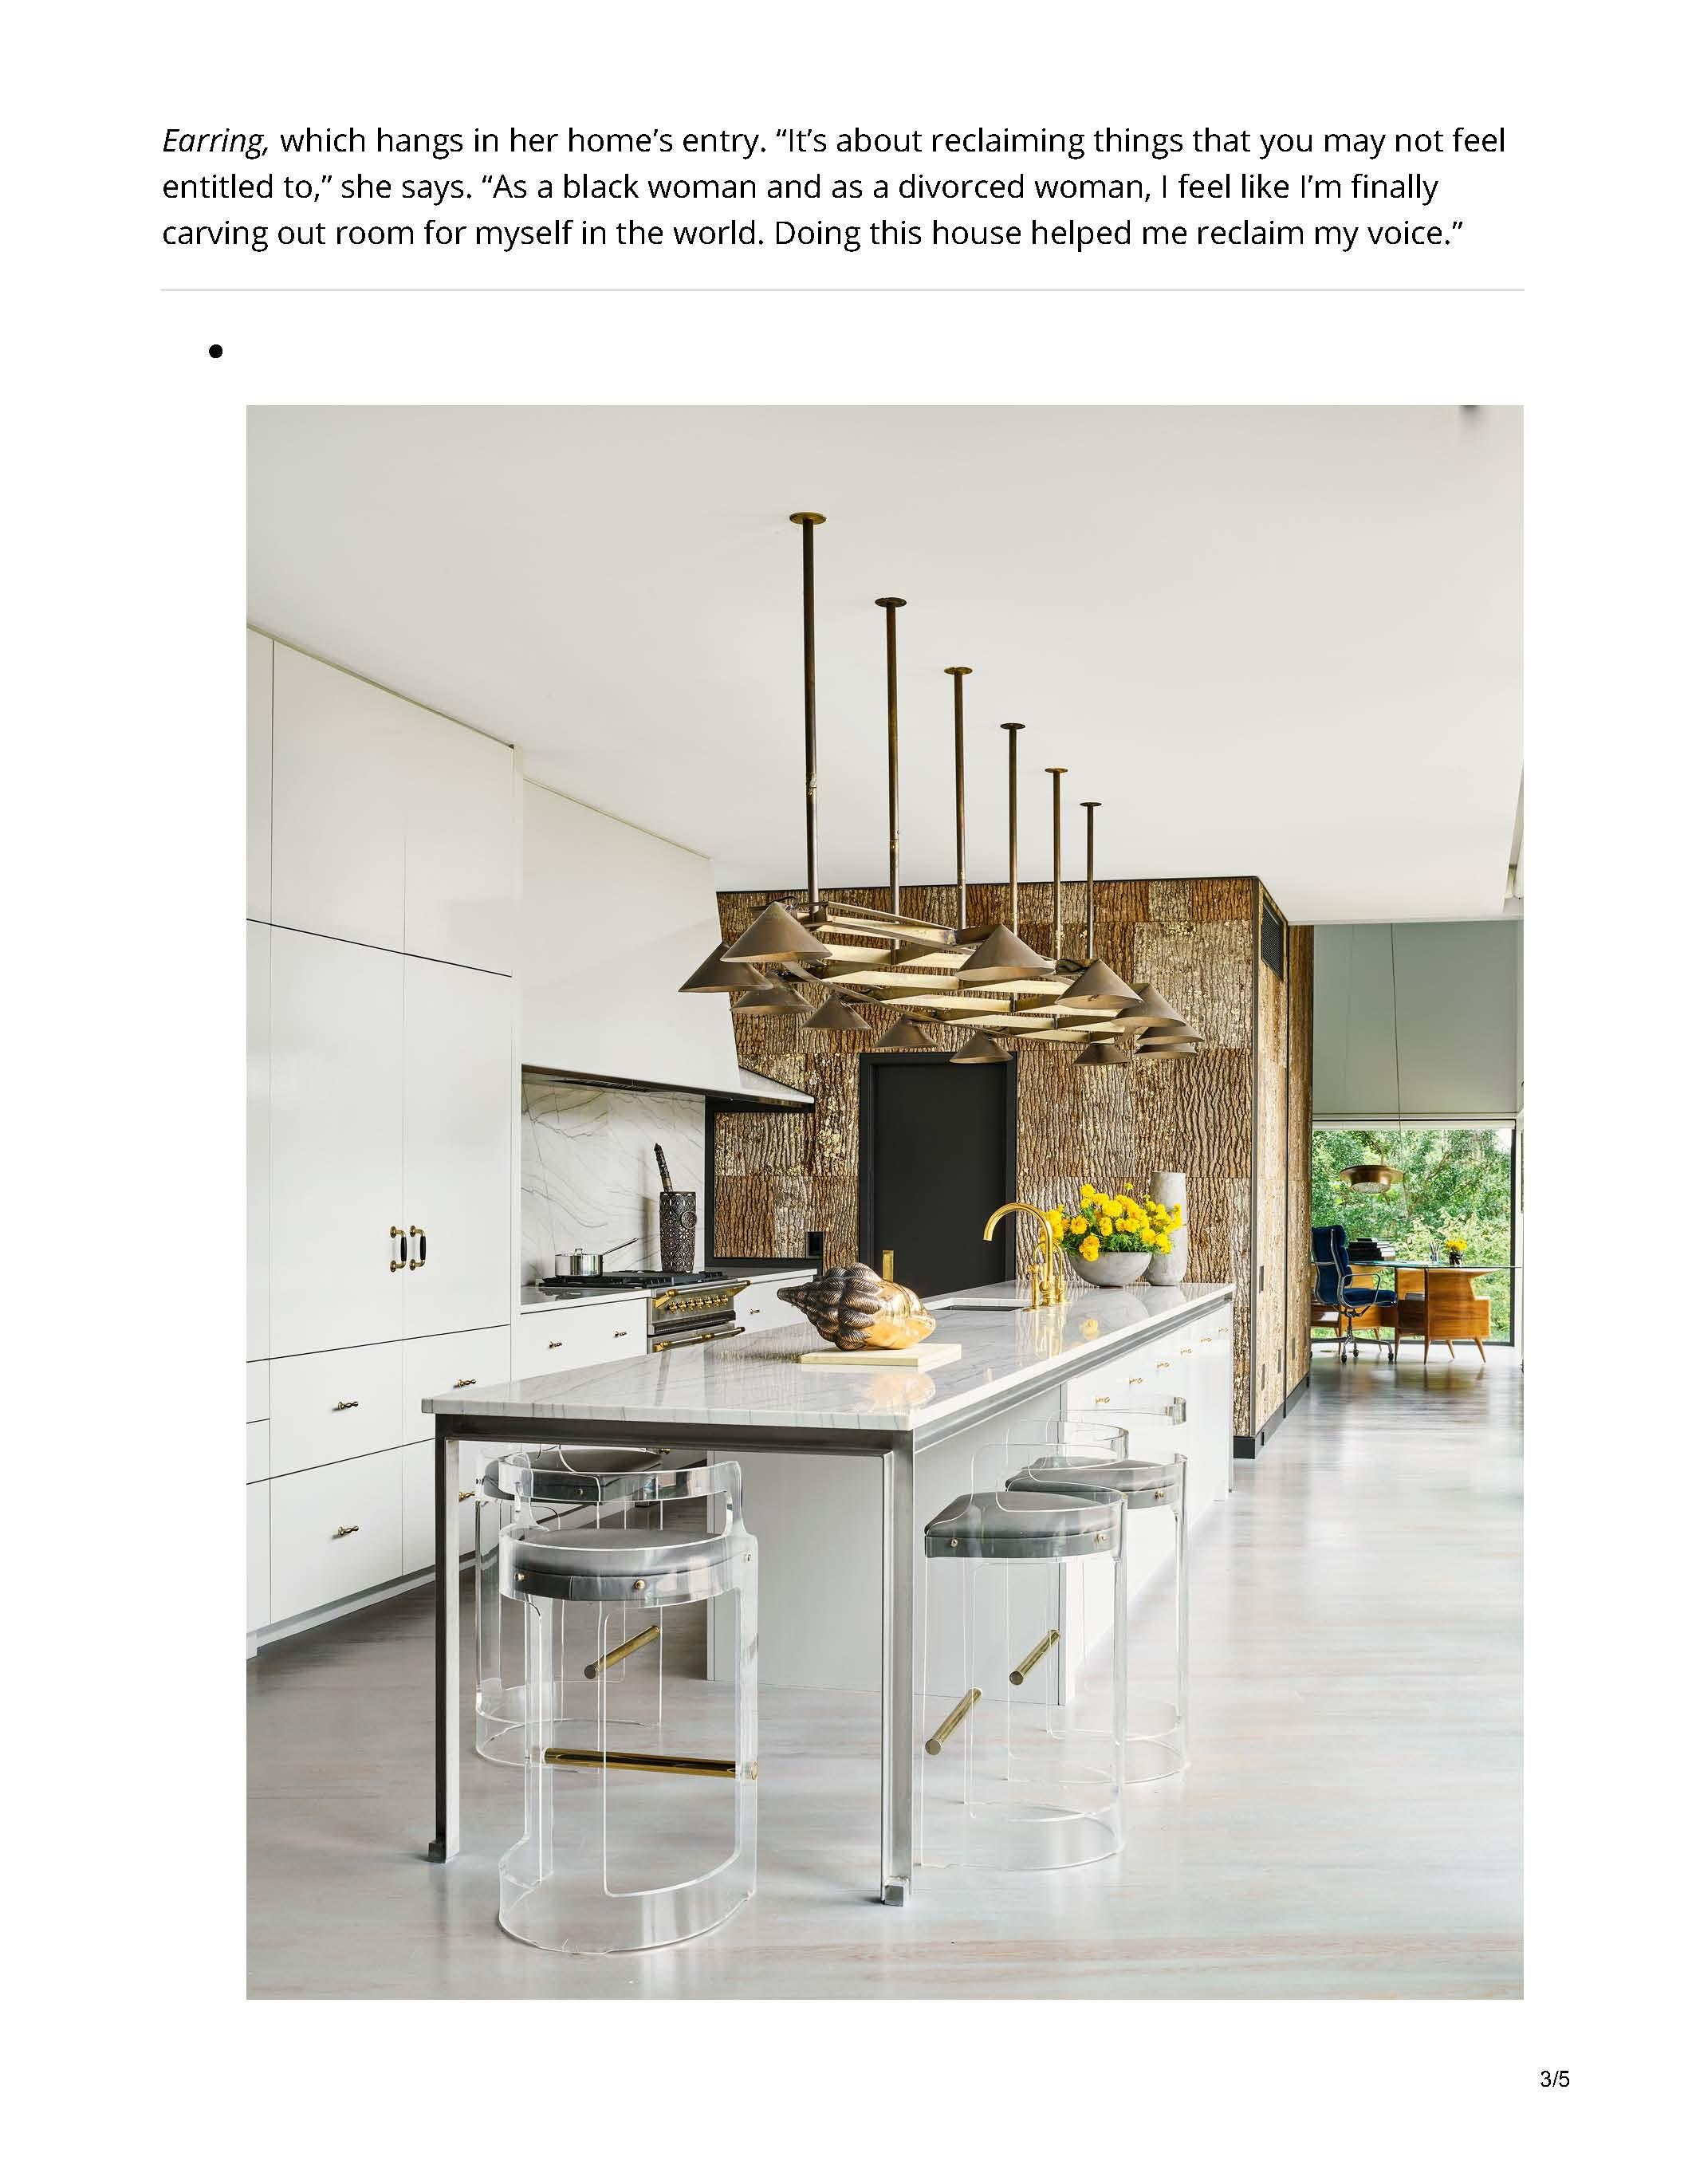 architecturaldigest.com-A Statement-Making Austin Home With a World-Clas..._Page_3.jpg